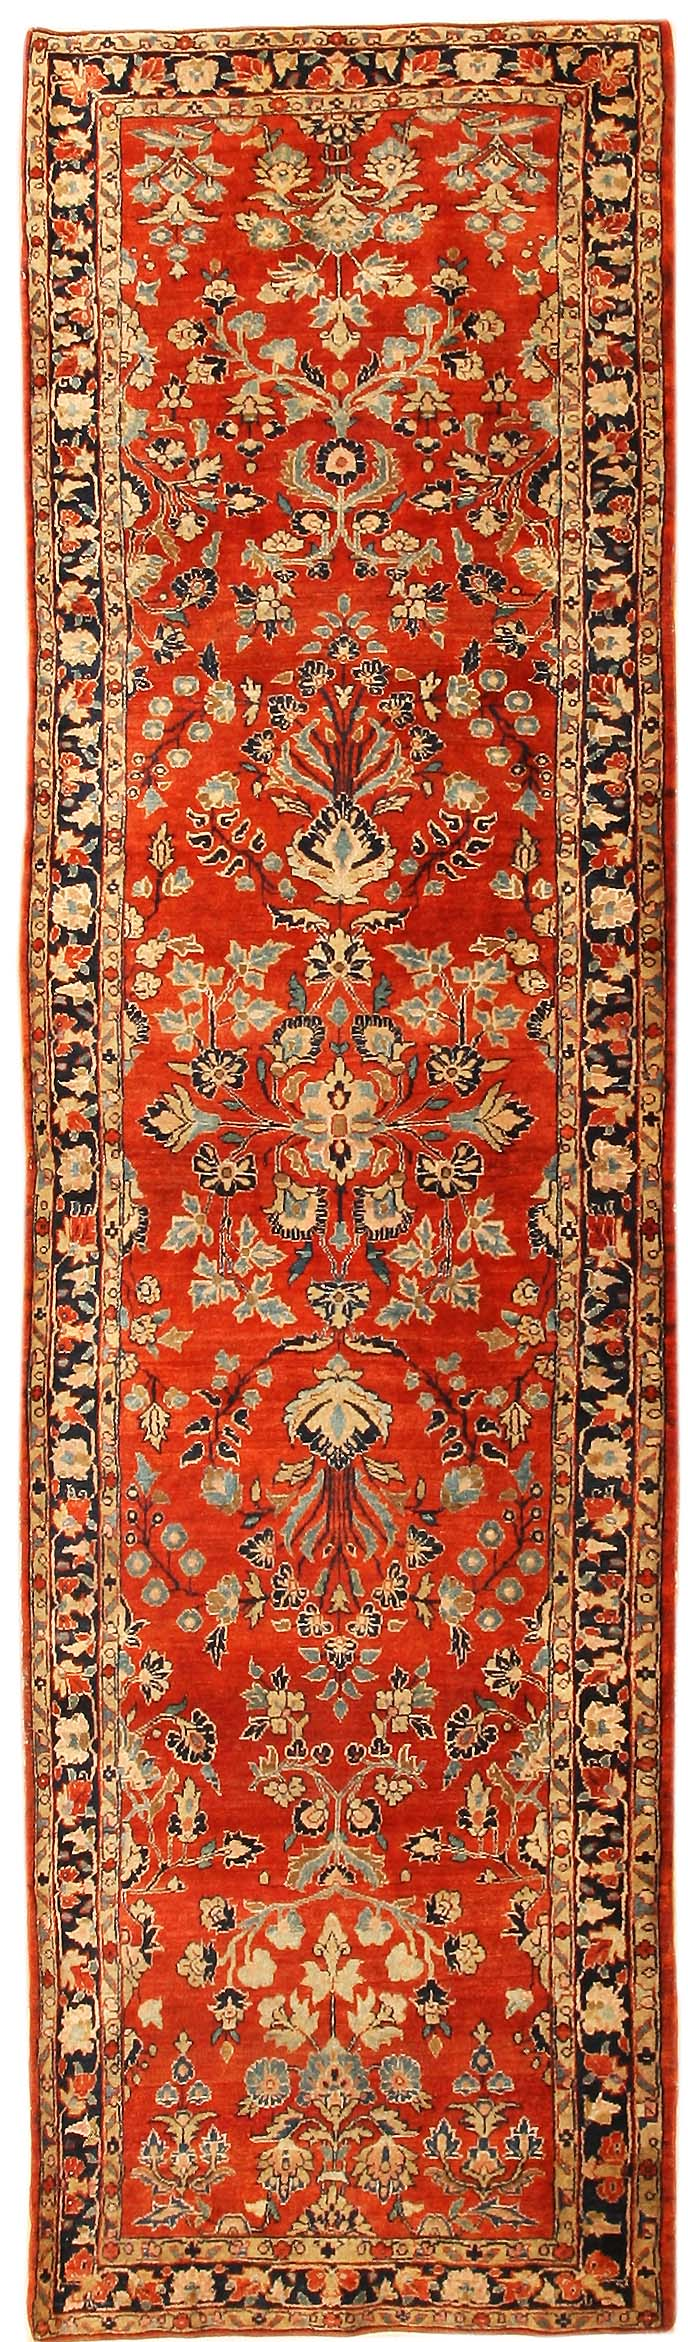 Antique Sarouk Persian Rug Runner 438422 Jpg 688 2 342 Pixels